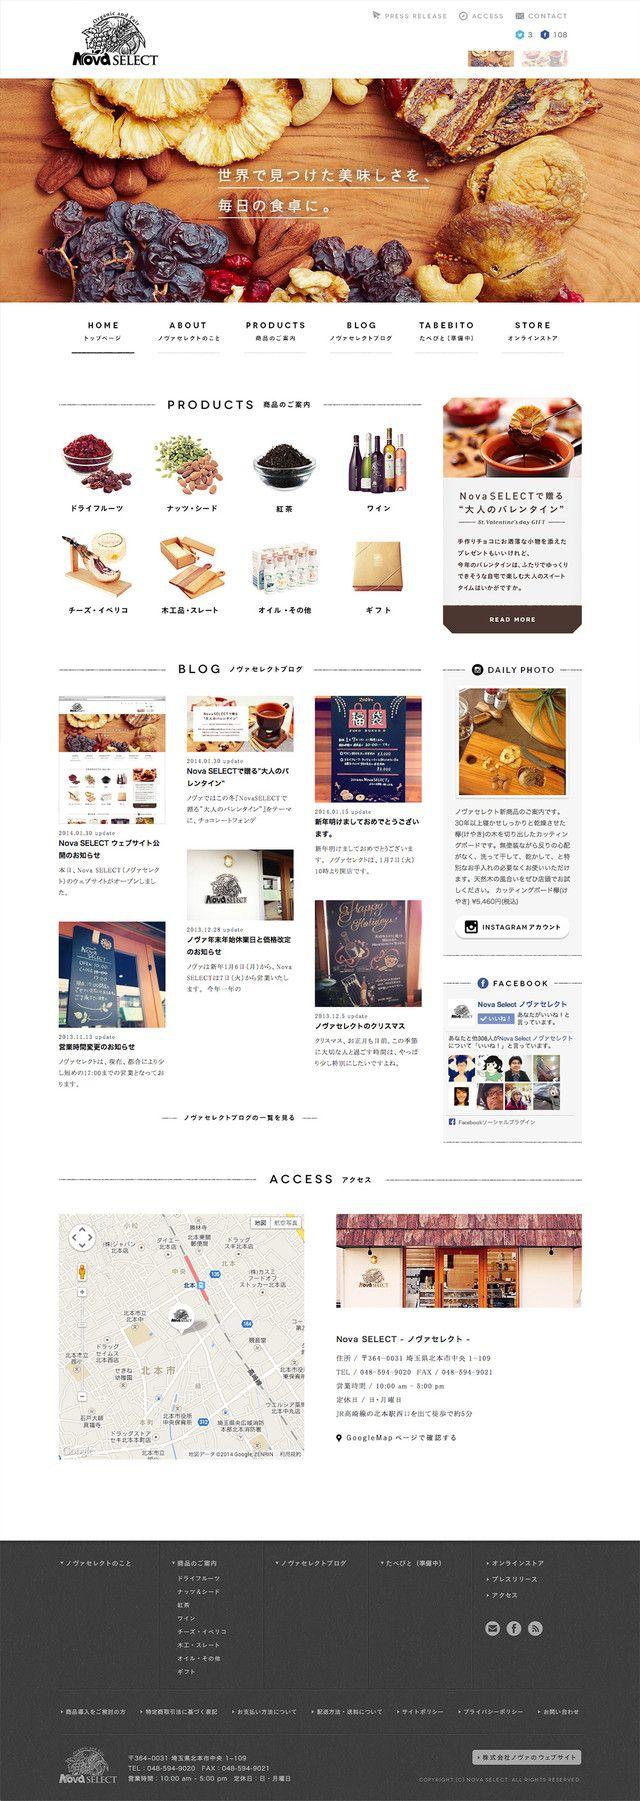 Nova SELECT ノヴァセレクト 本サイト - tadakitom | JAYPEG